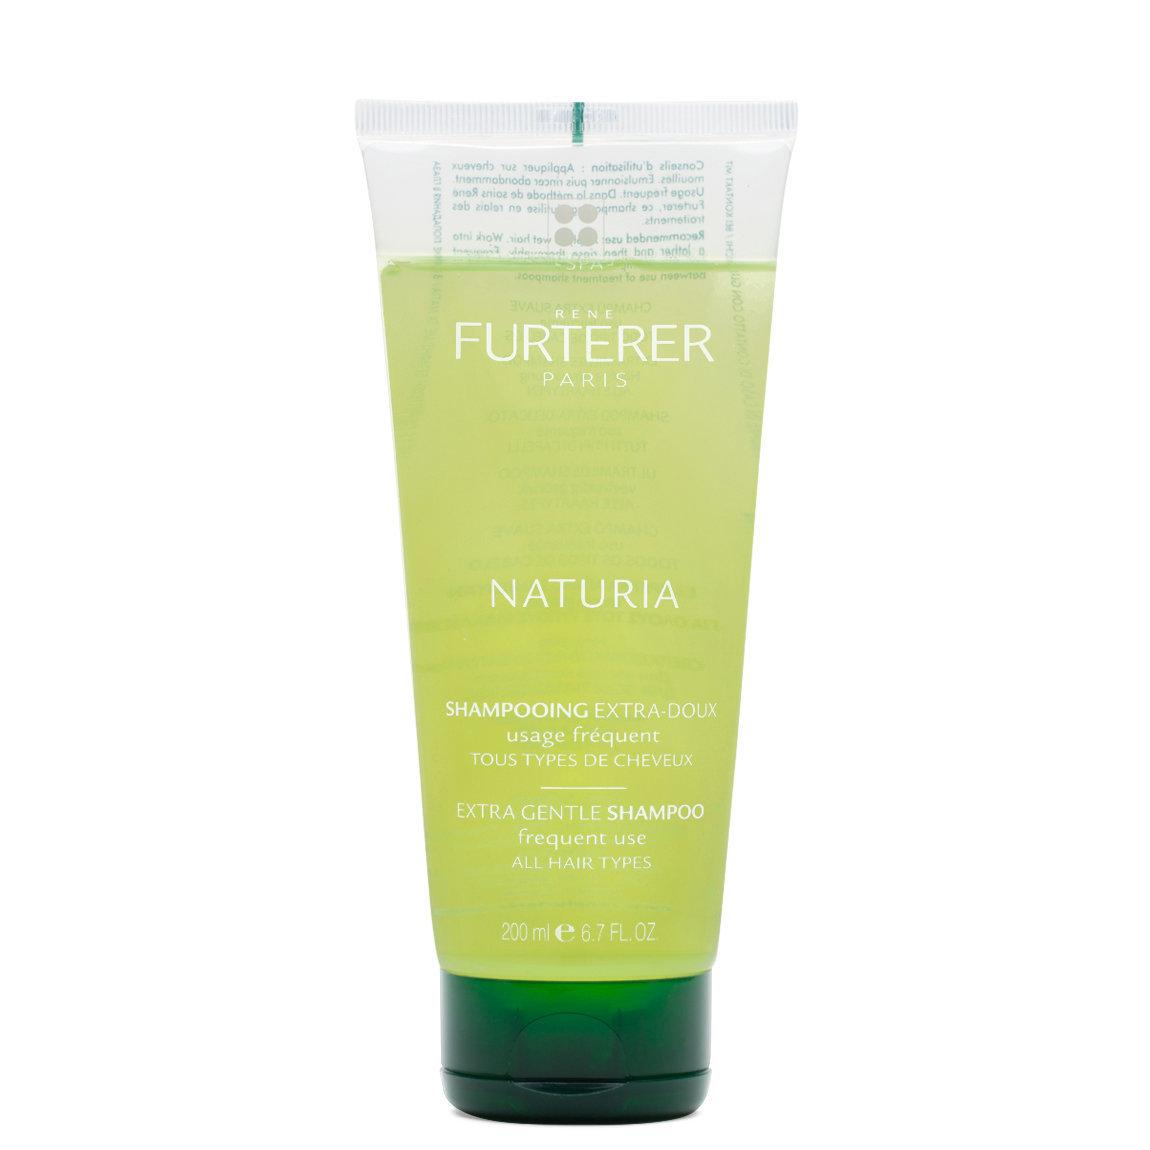 Rene Furterer Naturia Extra-Gentle Shampoo product swatch.